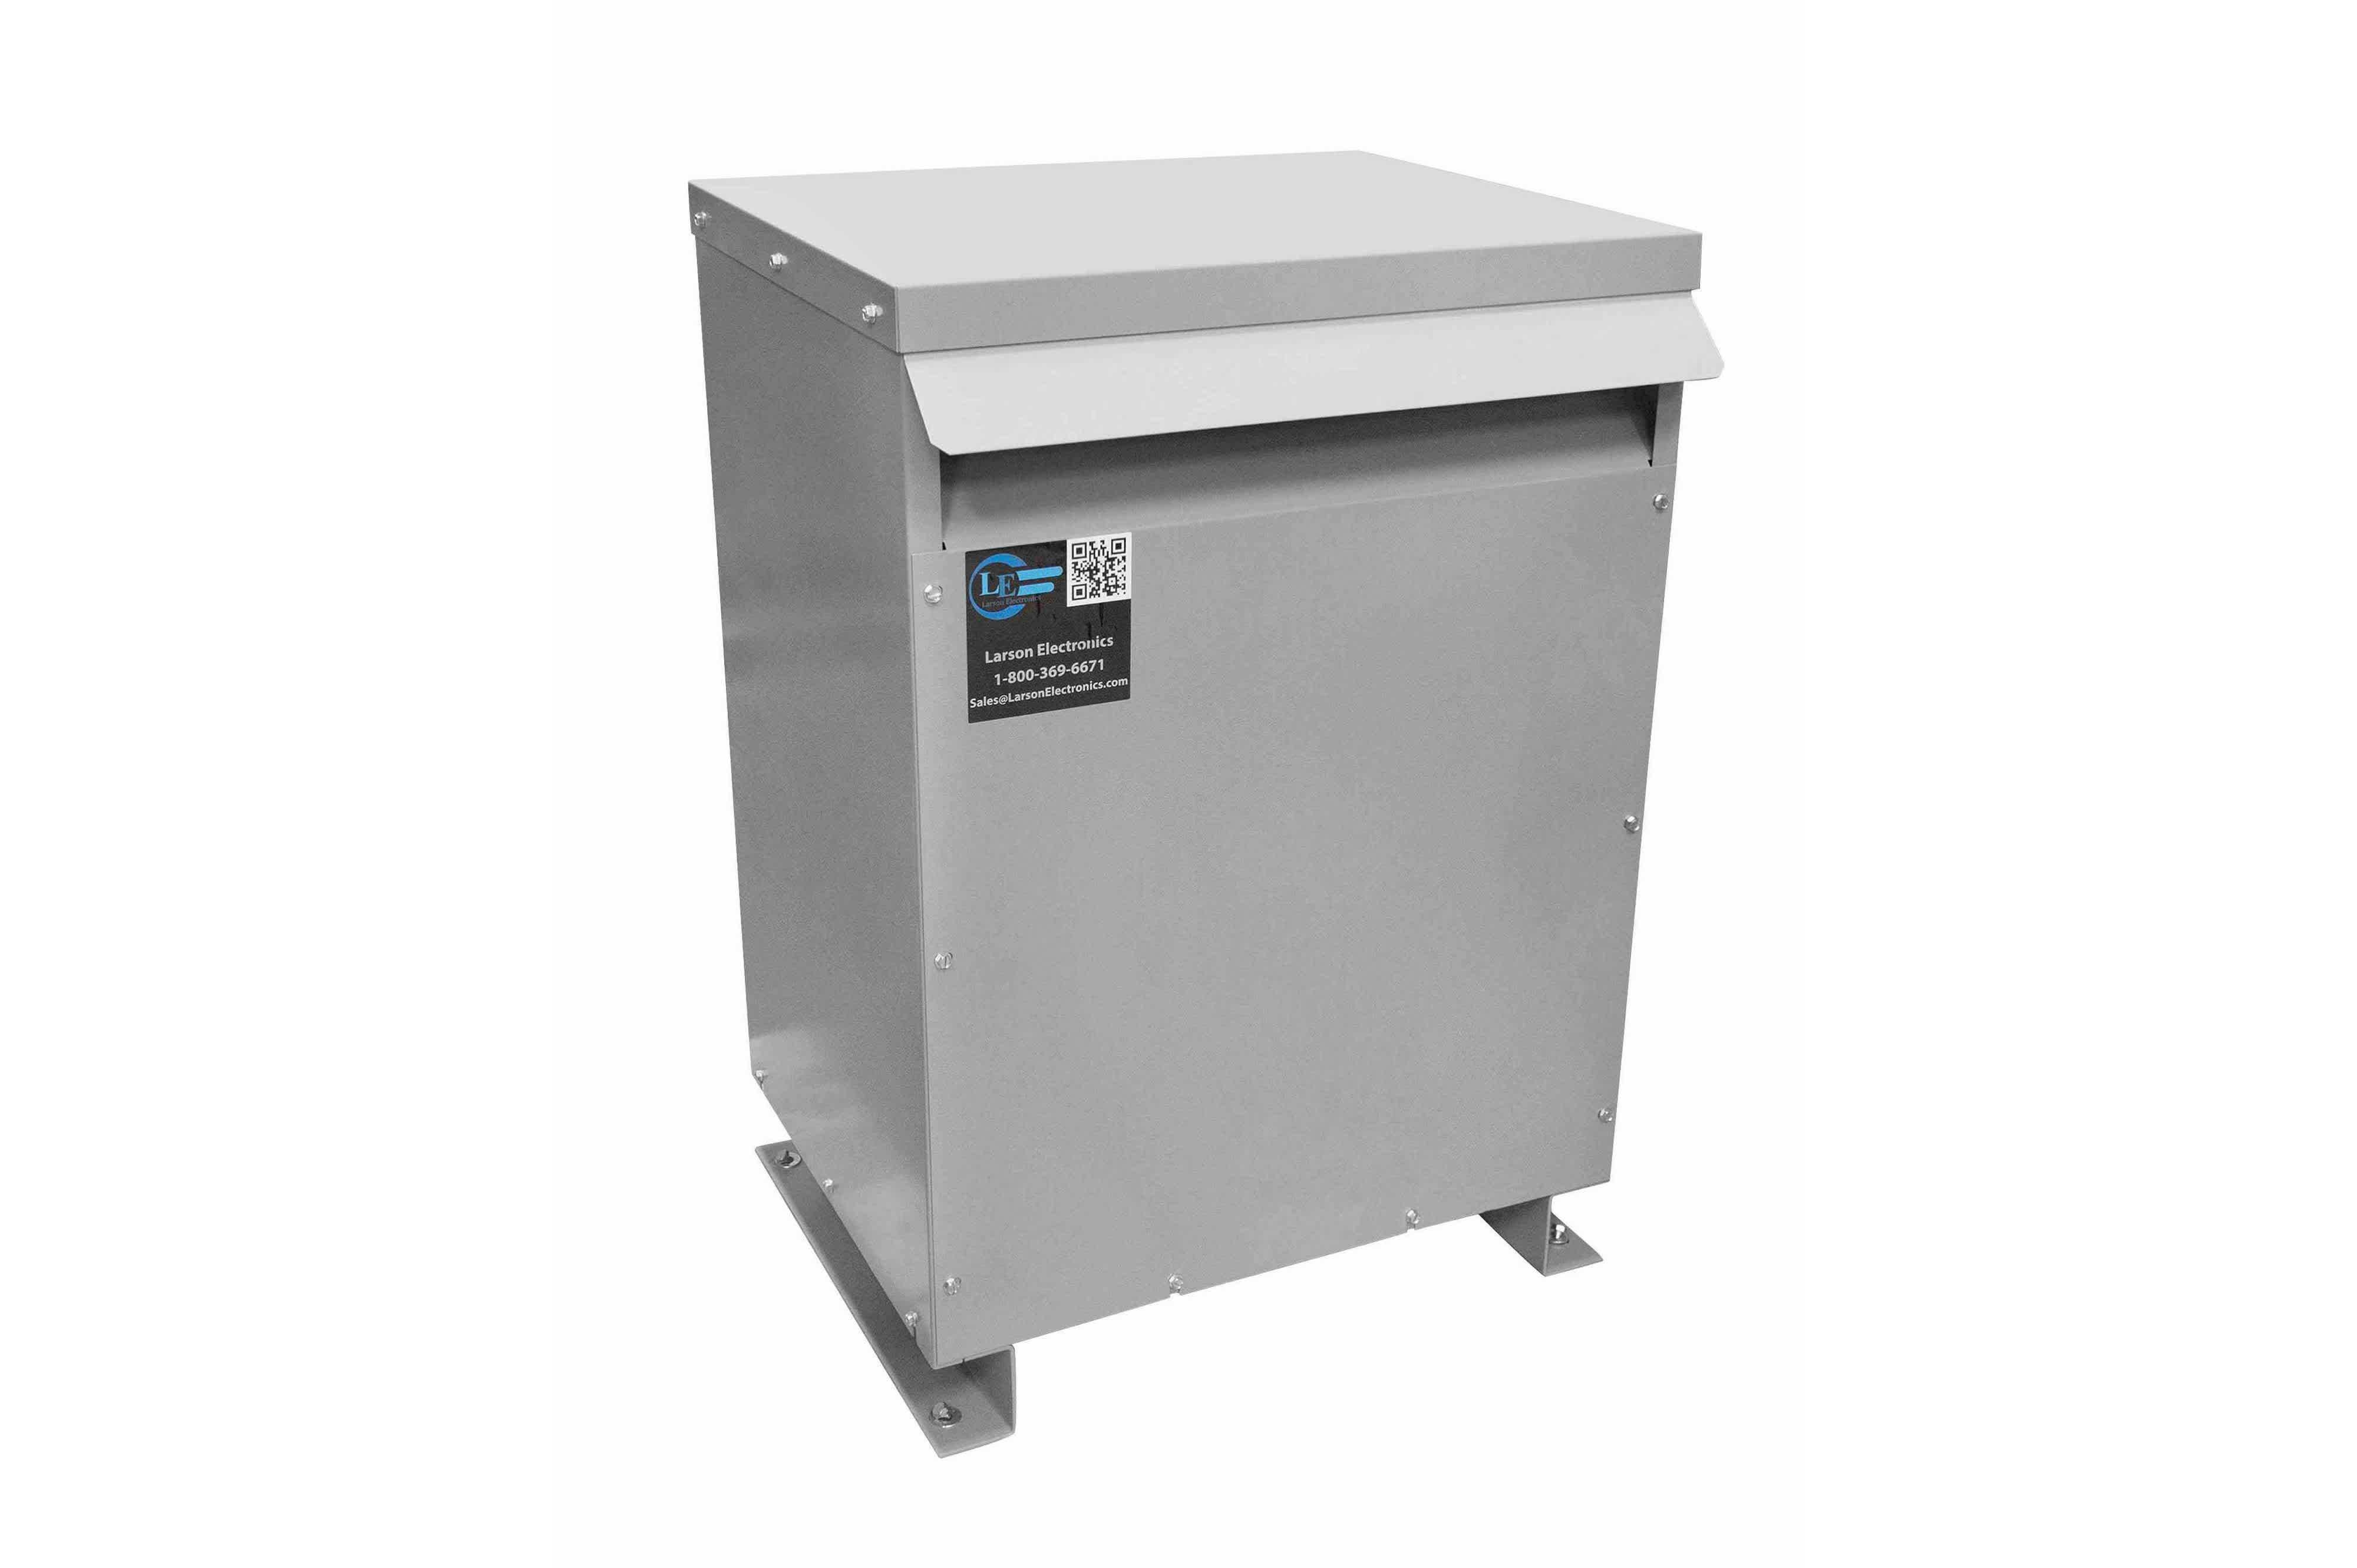 55 kVA 3PH Isolation Transformer, 208V Wye Primary, 400Y/231 Wye-N Secondary, N3R, Ventilated, 60 Hz